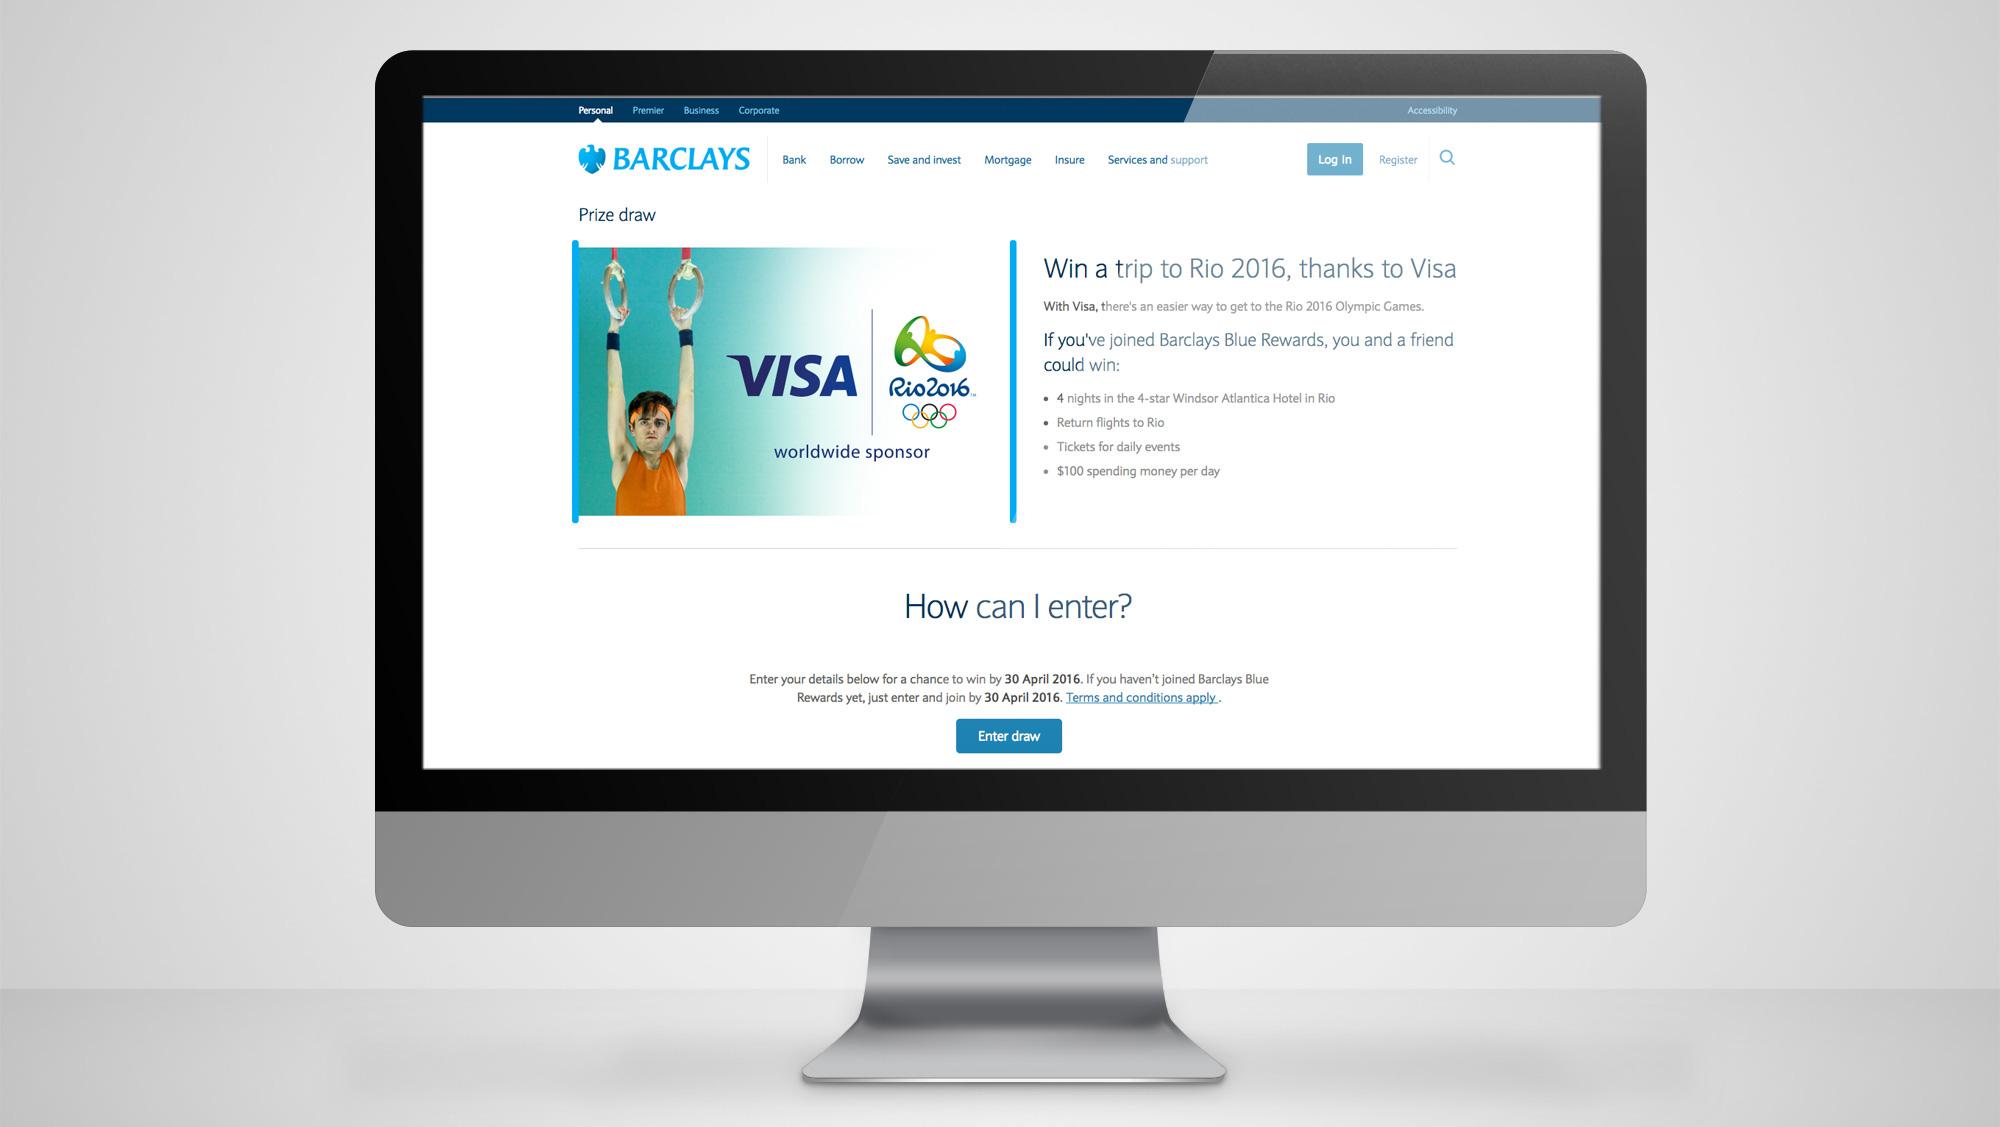 Barclays-Film-Web-Desktop.jpg